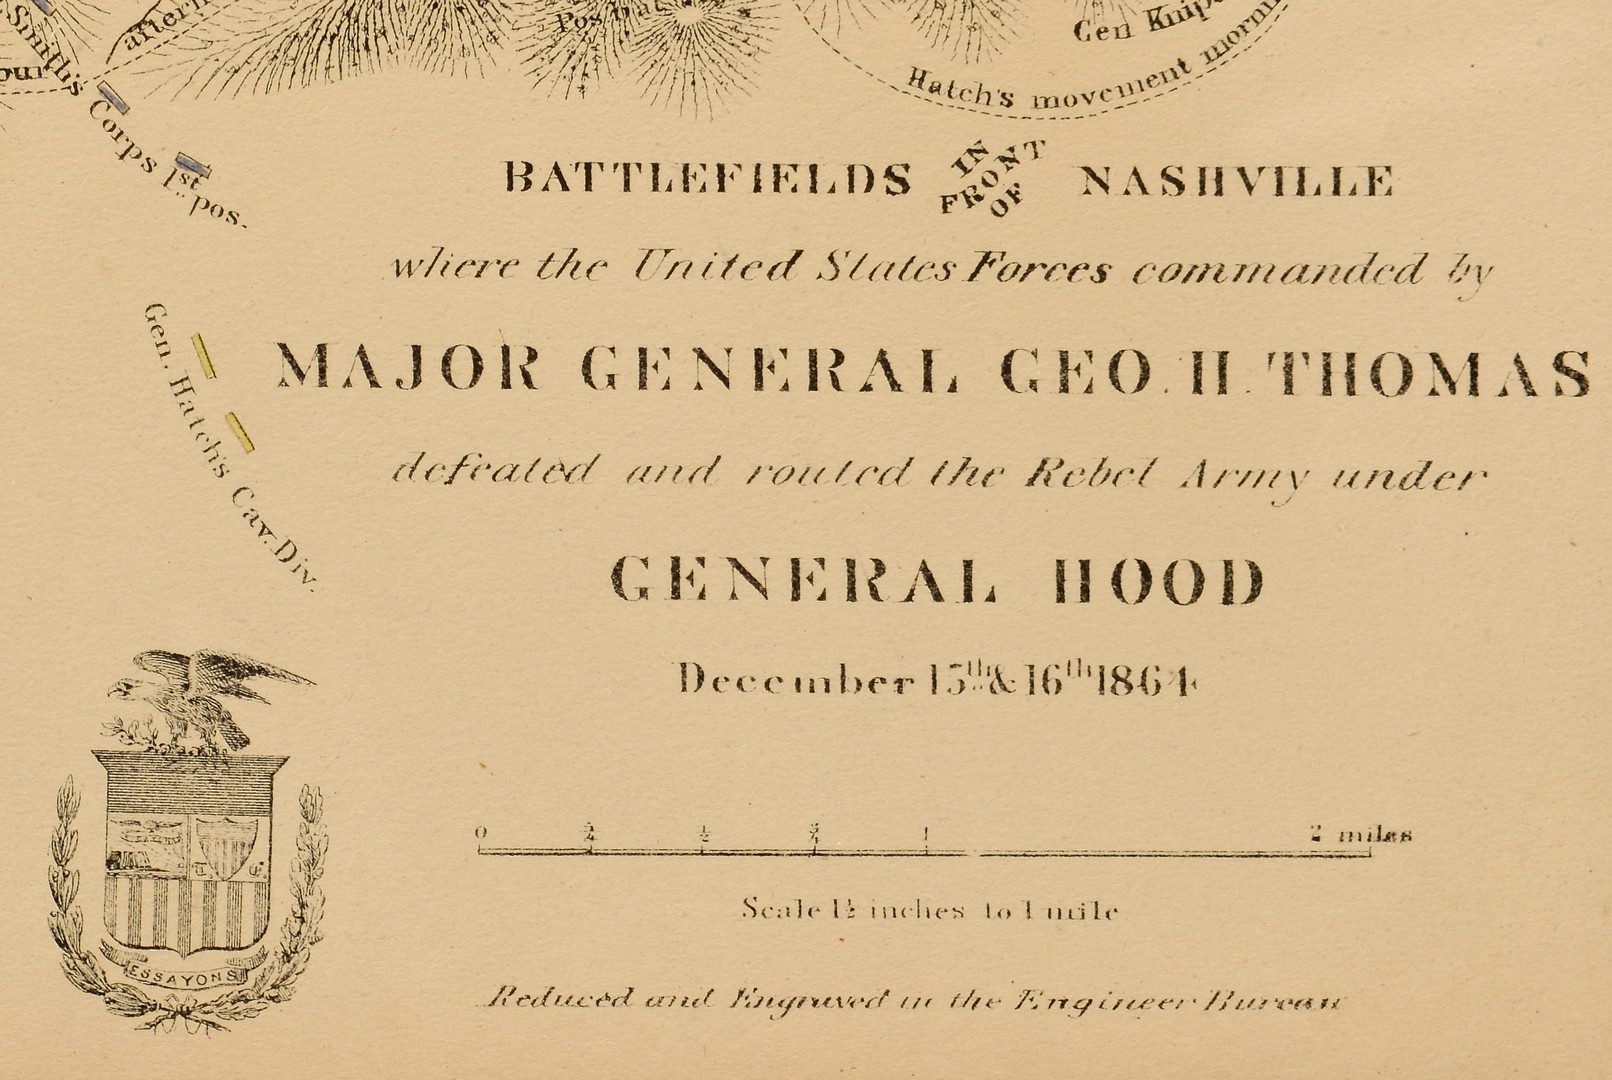 Lot 548: Nashville Battlefields and TN Map